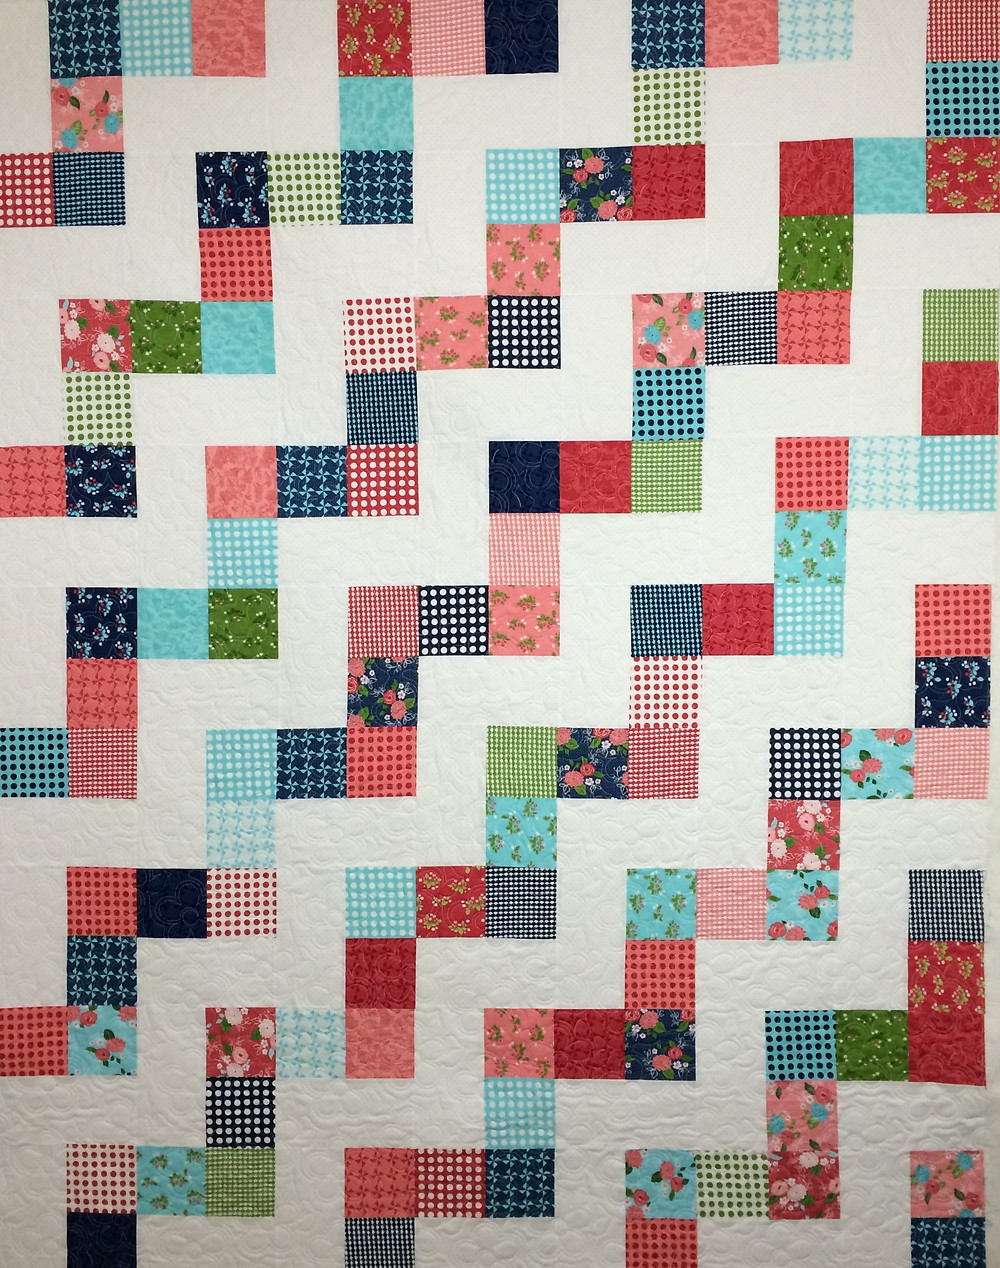 No Bake Gooseberry Quilt in scrappy prints